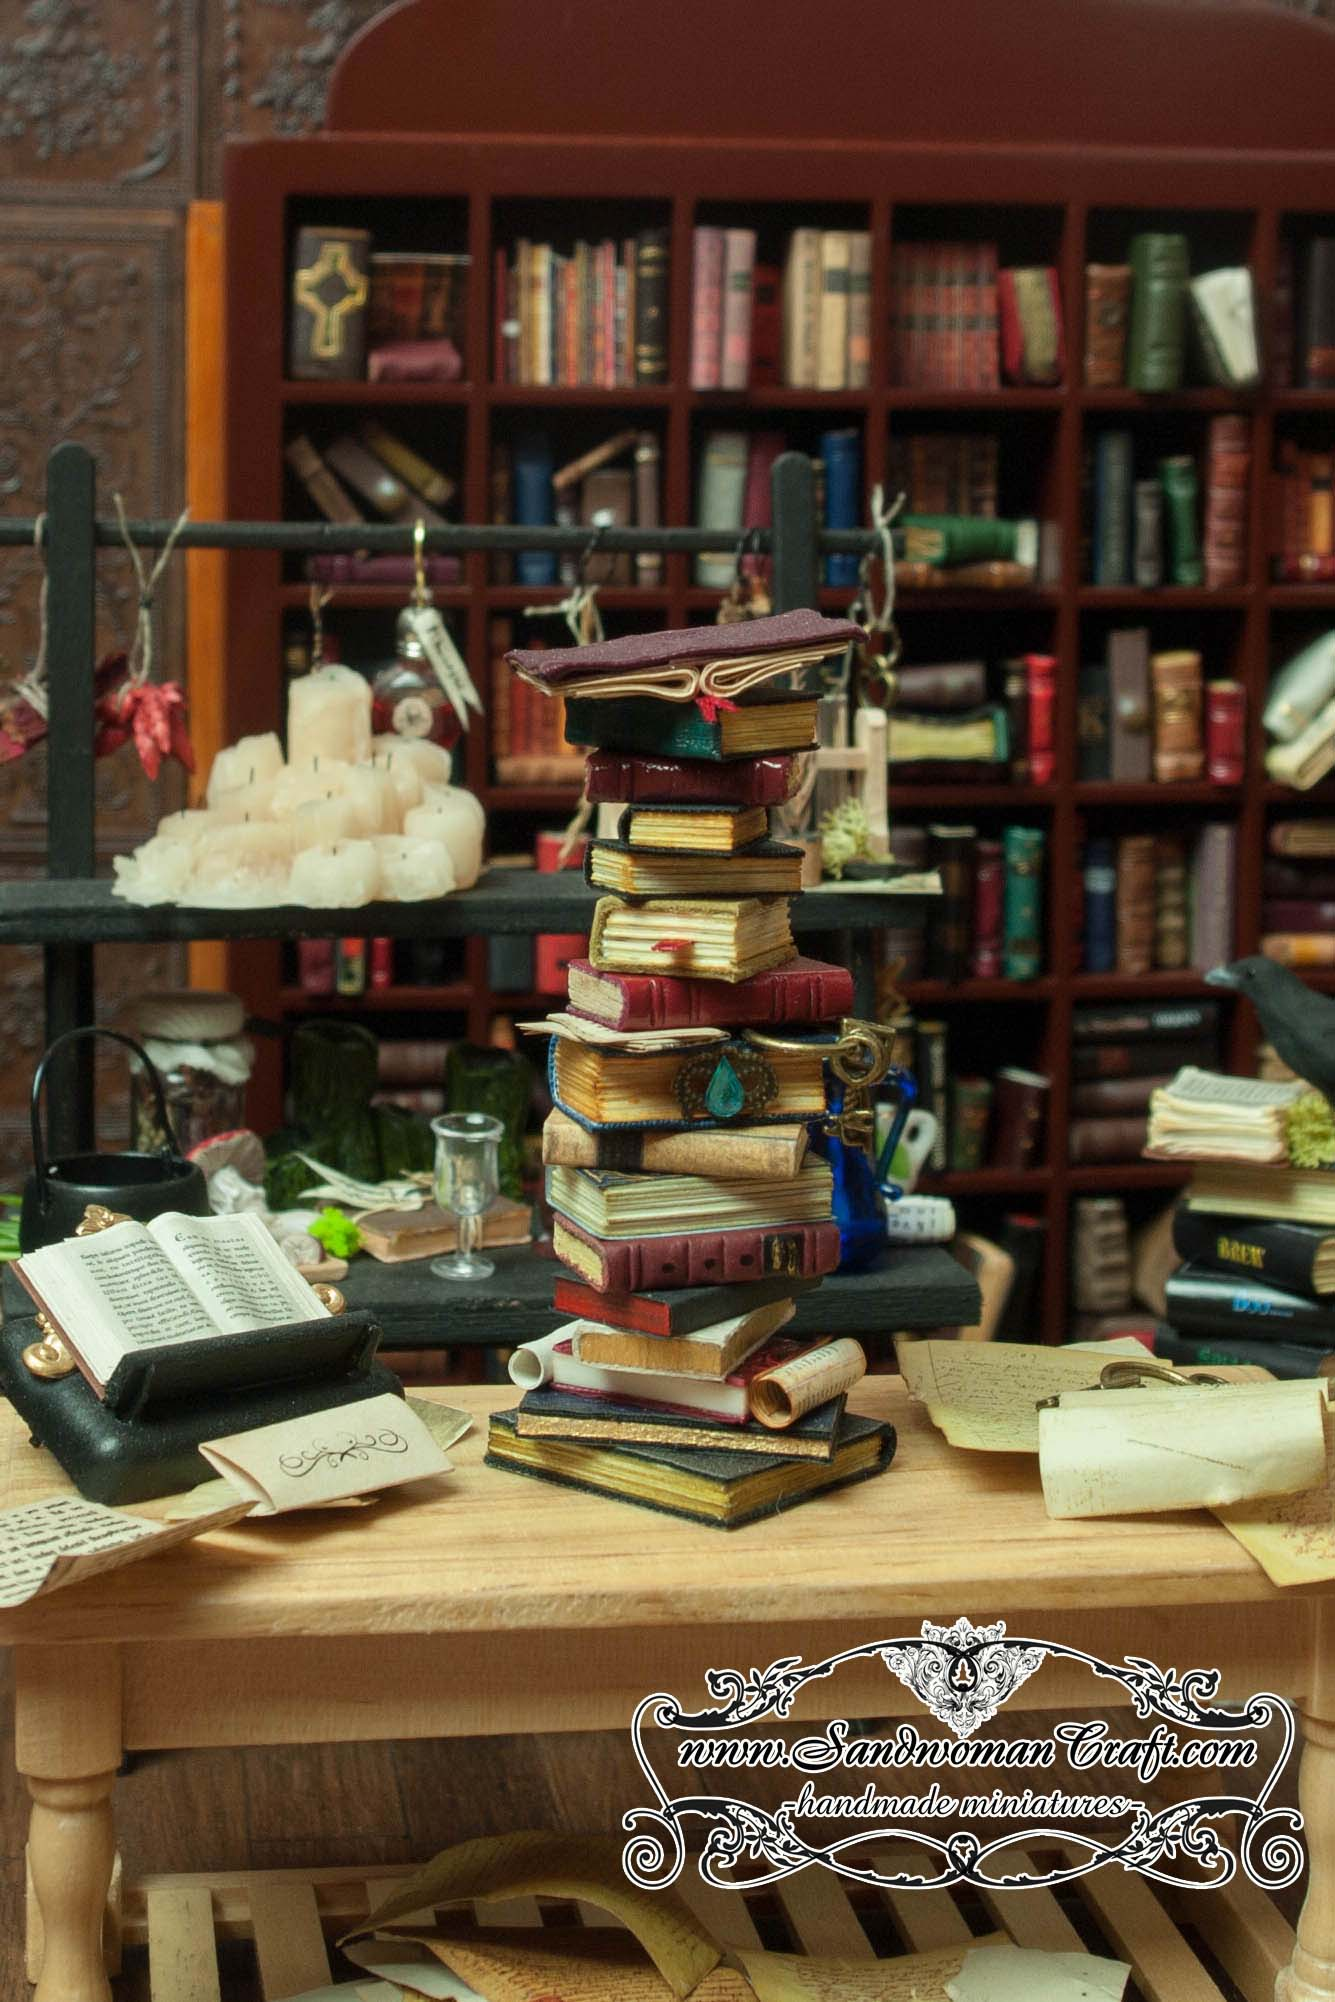 Miniature leather books in 1:12 scale